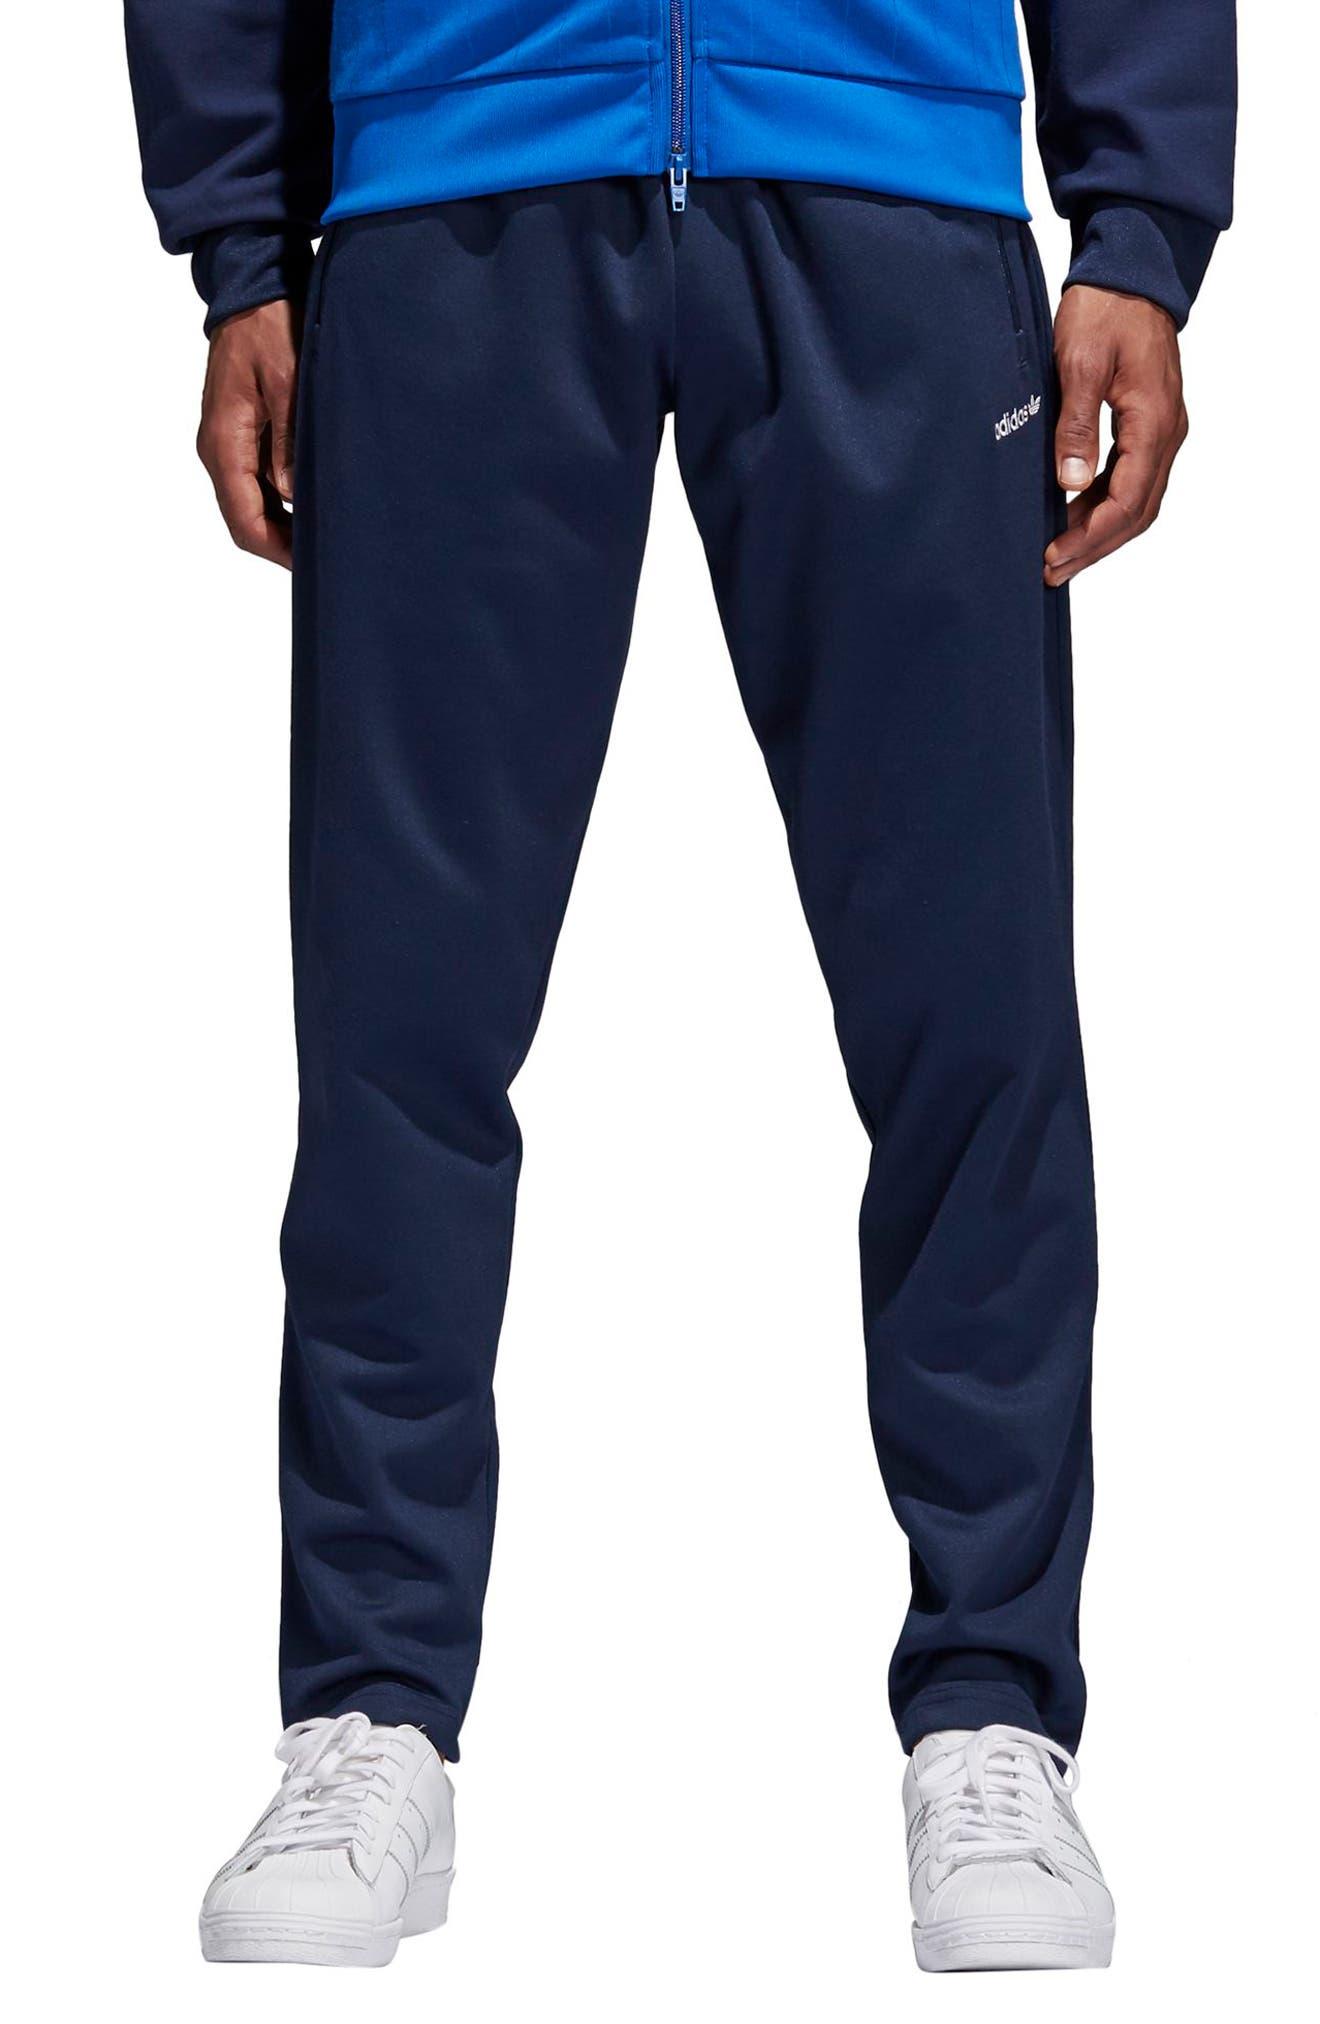 Originals Training Pants,                         Main,                         color, 415